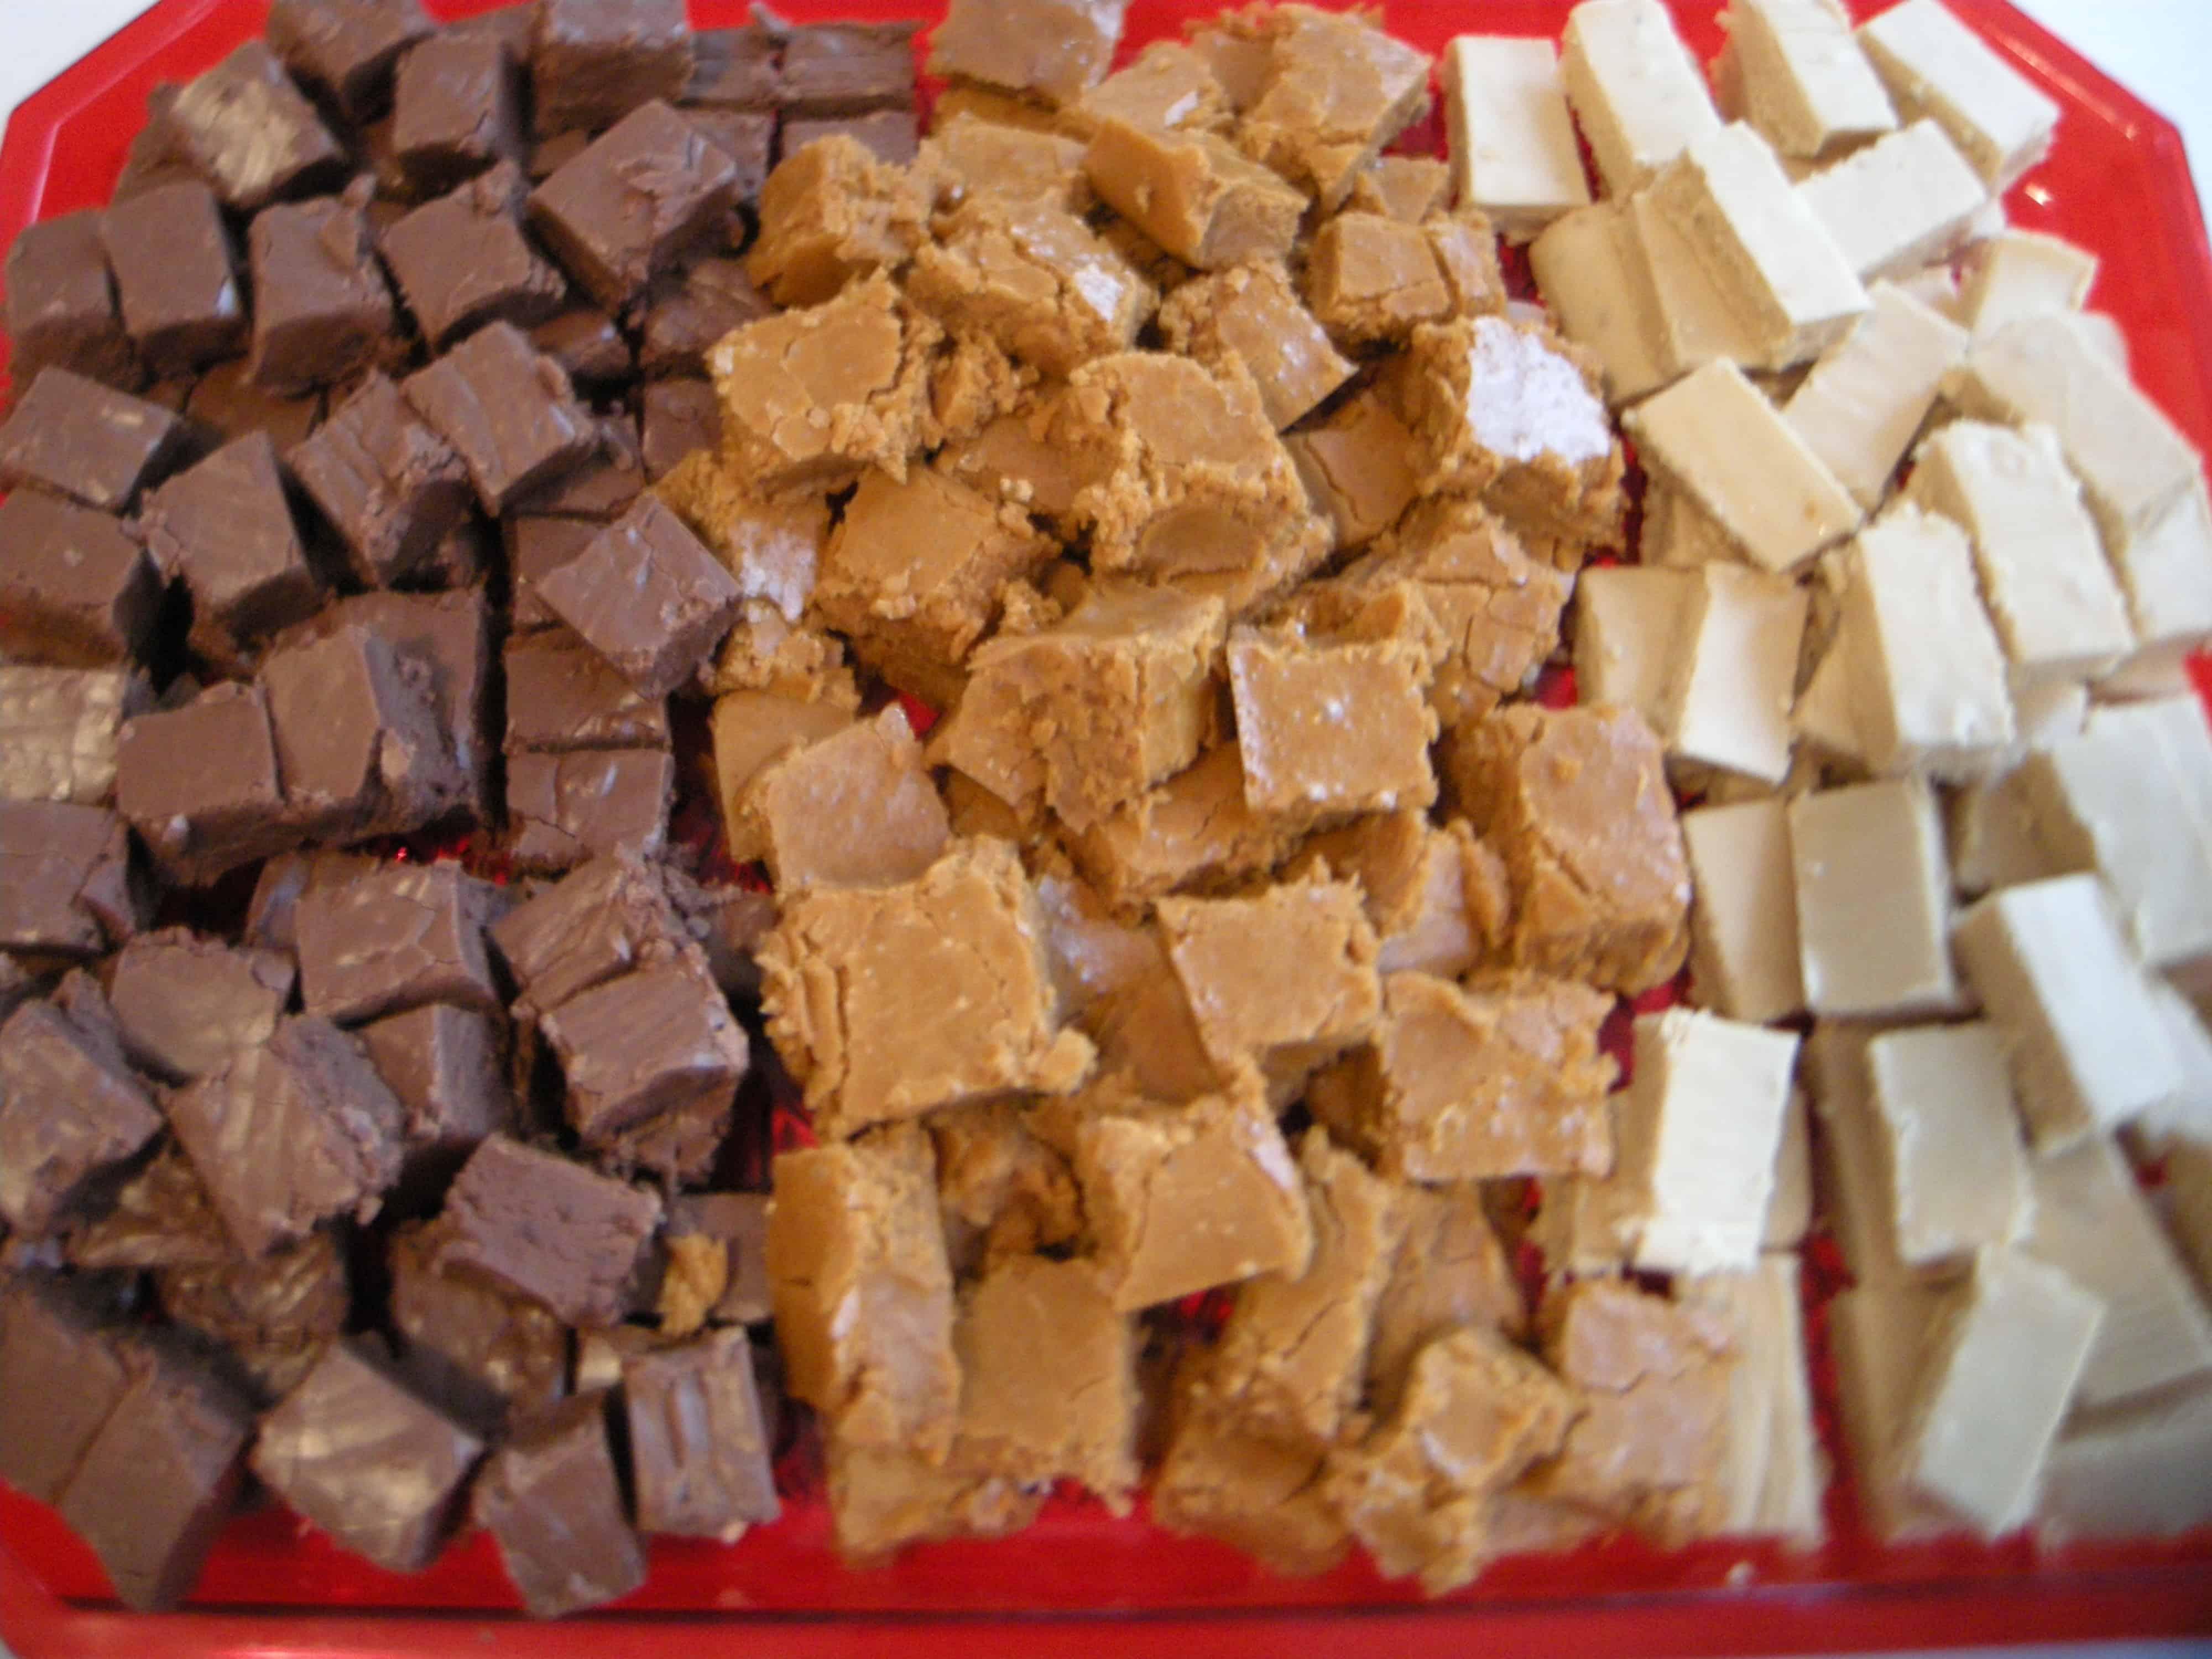 Cinnabun, Chocolate, or Peanut Butter Fudge!